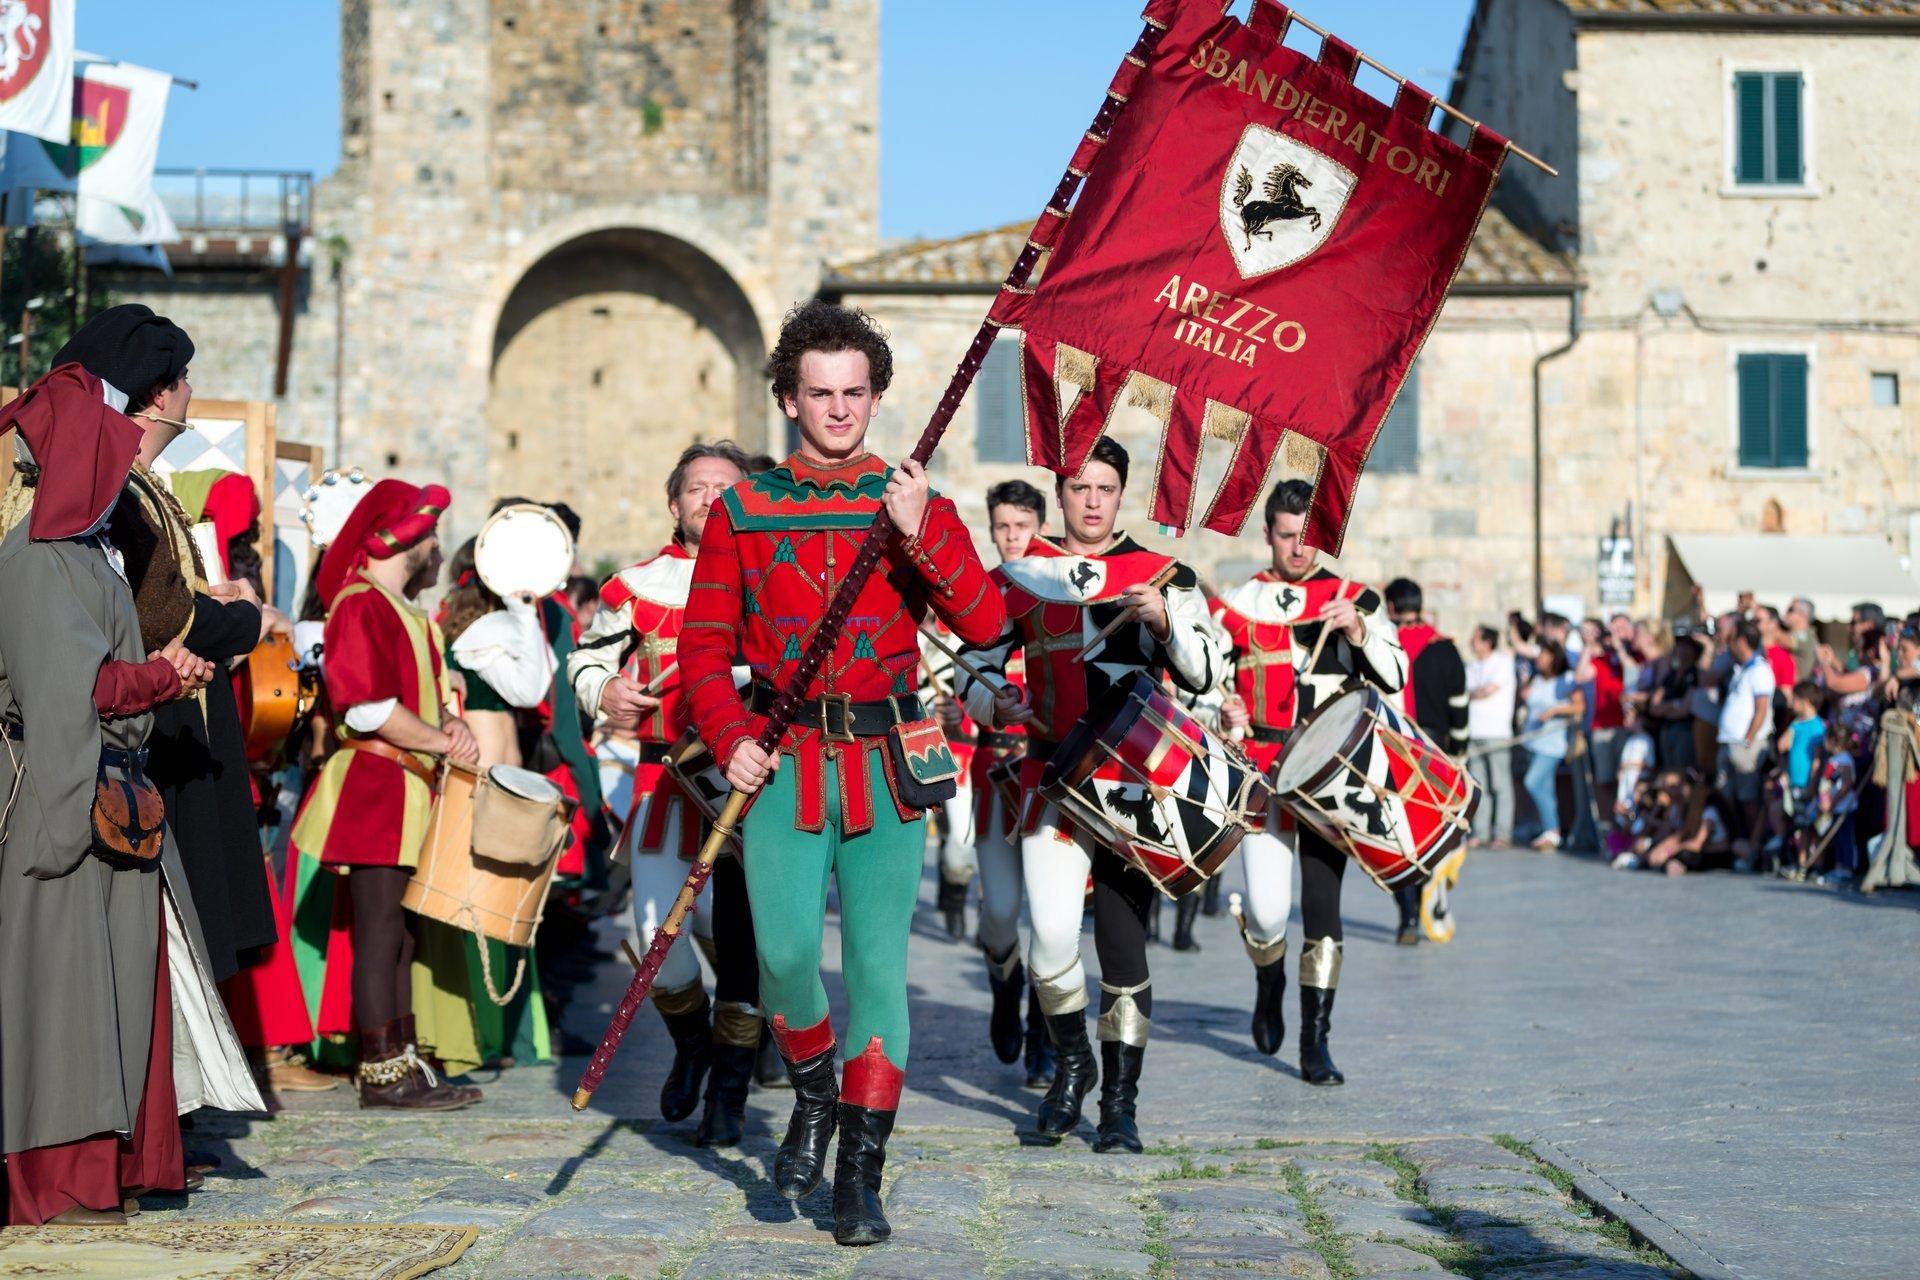 Medieval Festival Monteriggioni in Tuscany 2020 - Best Time